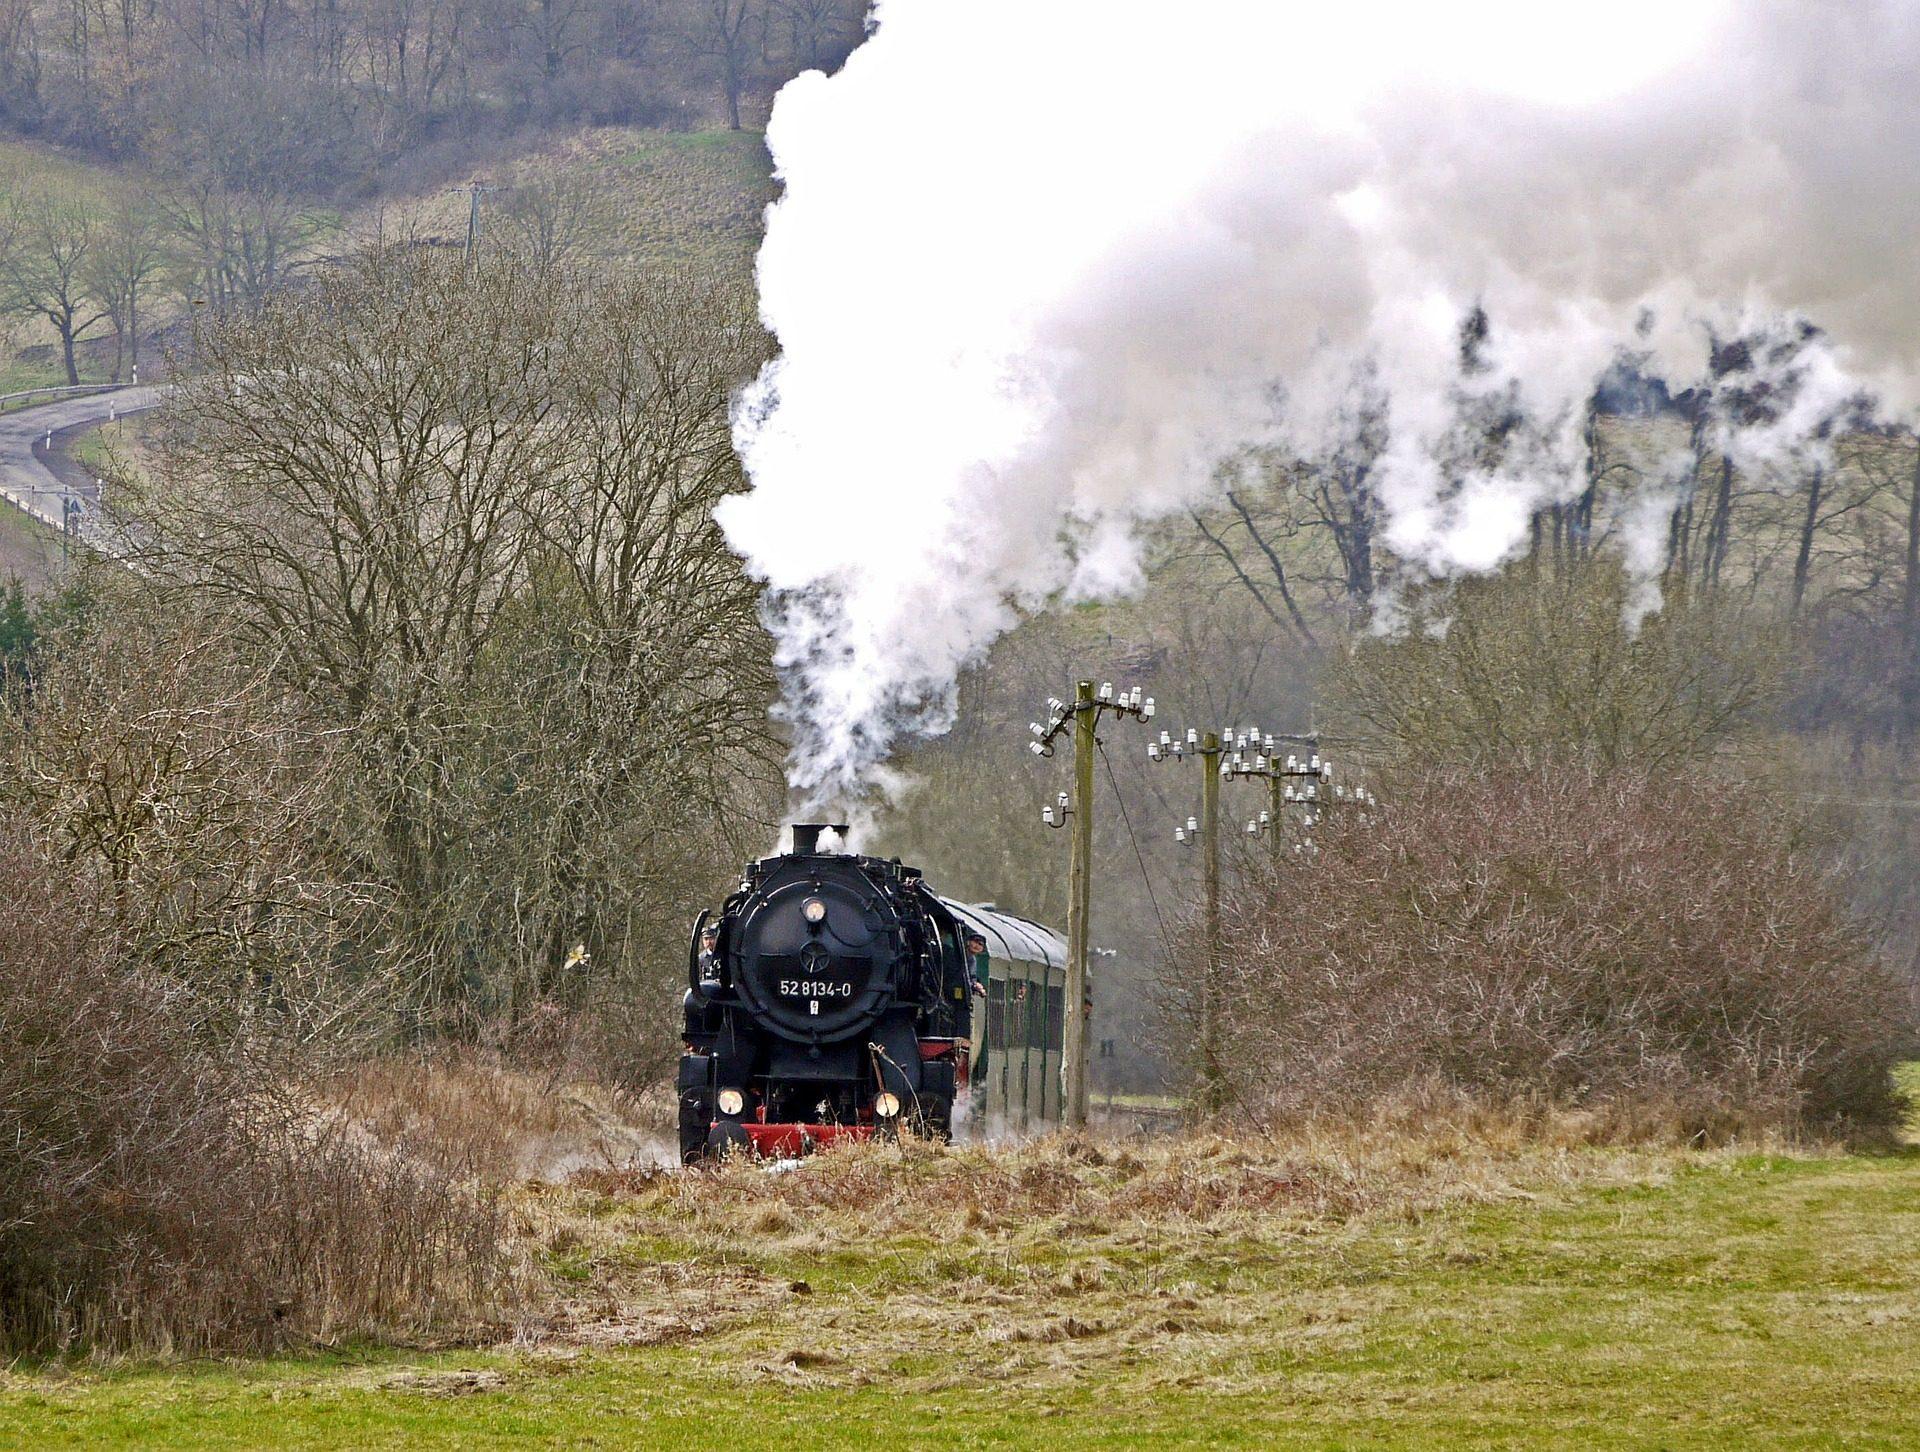 tren, vapor, locomotora, humo, campo - Fondos de Pantalla HD - professor-falken.com